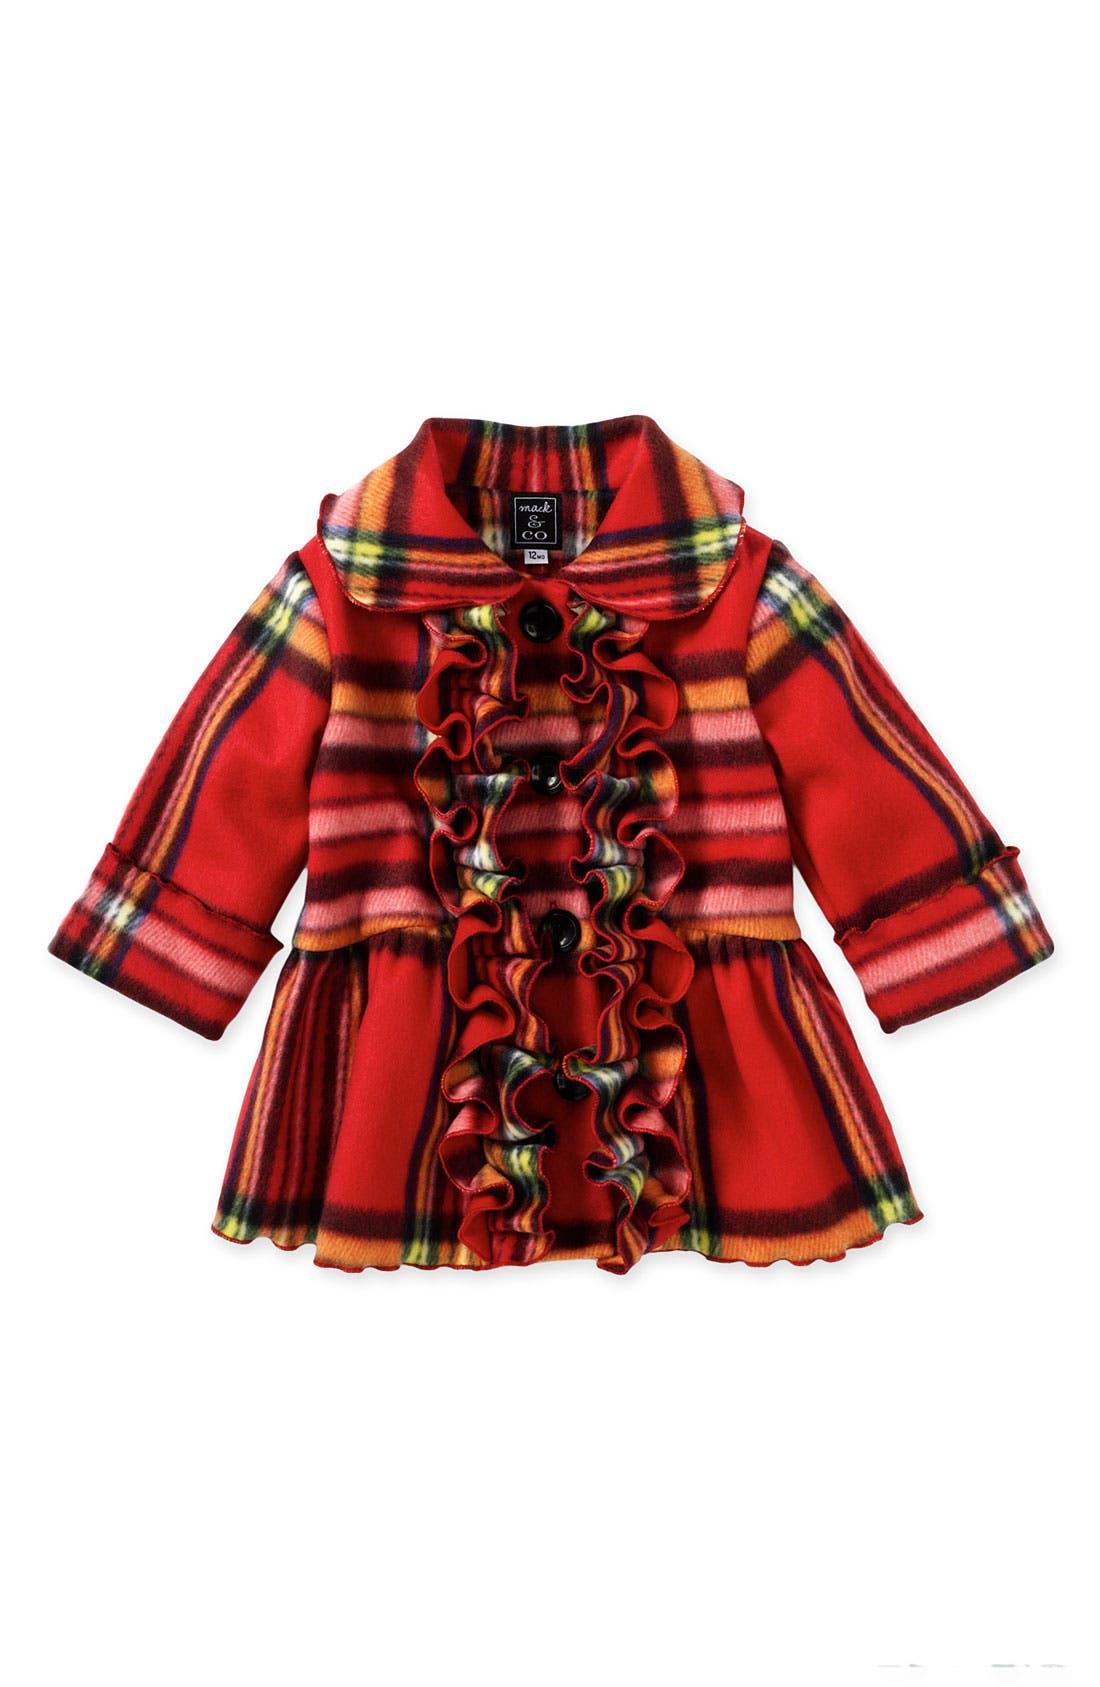 Alternate Image 1 Selected - Mack & Co. Ruffle Front Coat (Infant)